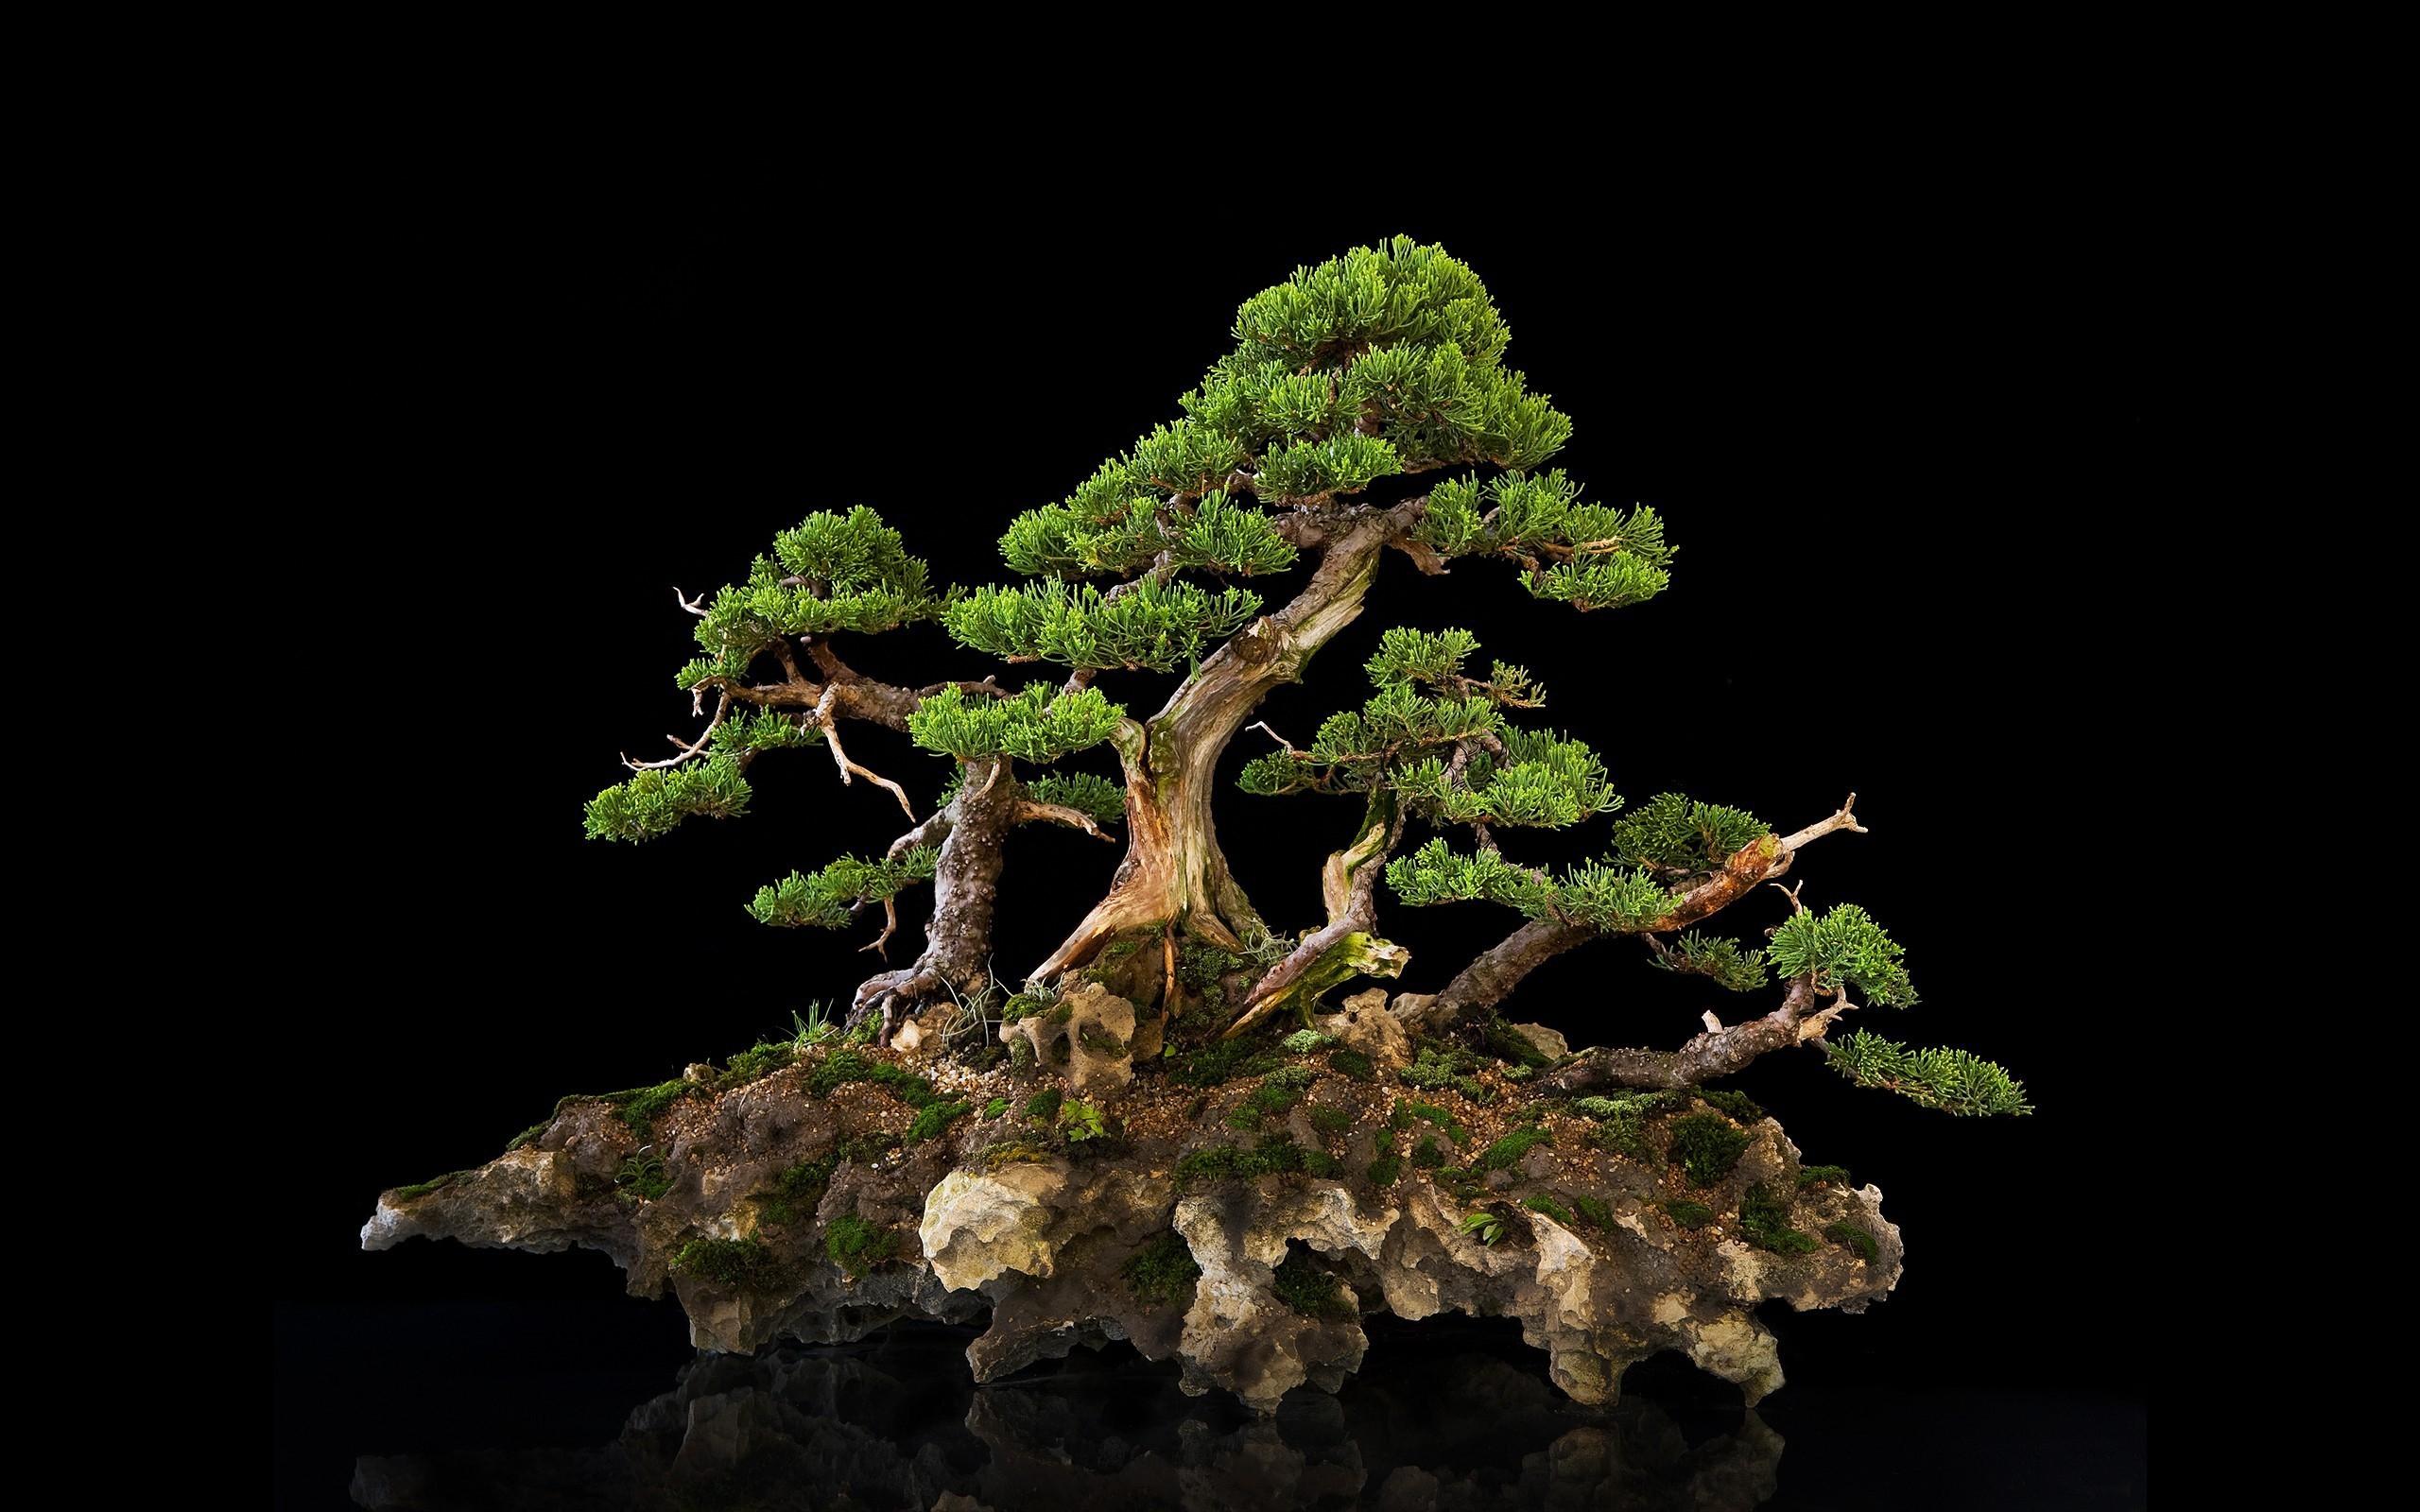 Bonsai Tree Wallpaper For Desktop